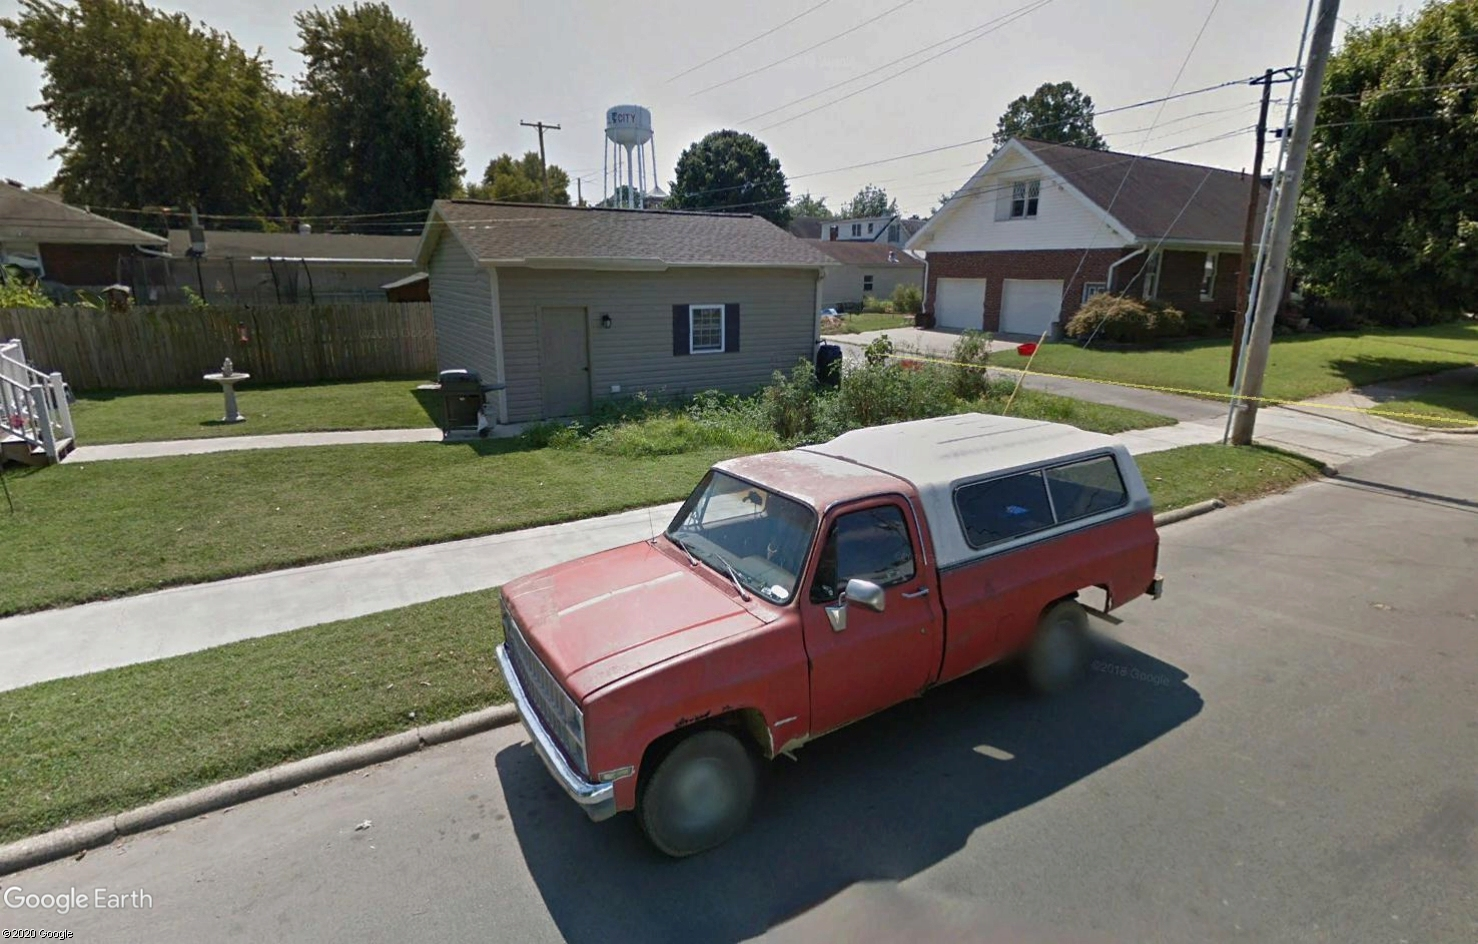 STREET VIEW : les vieilles voitures américaines - Page 5 Tsge1537